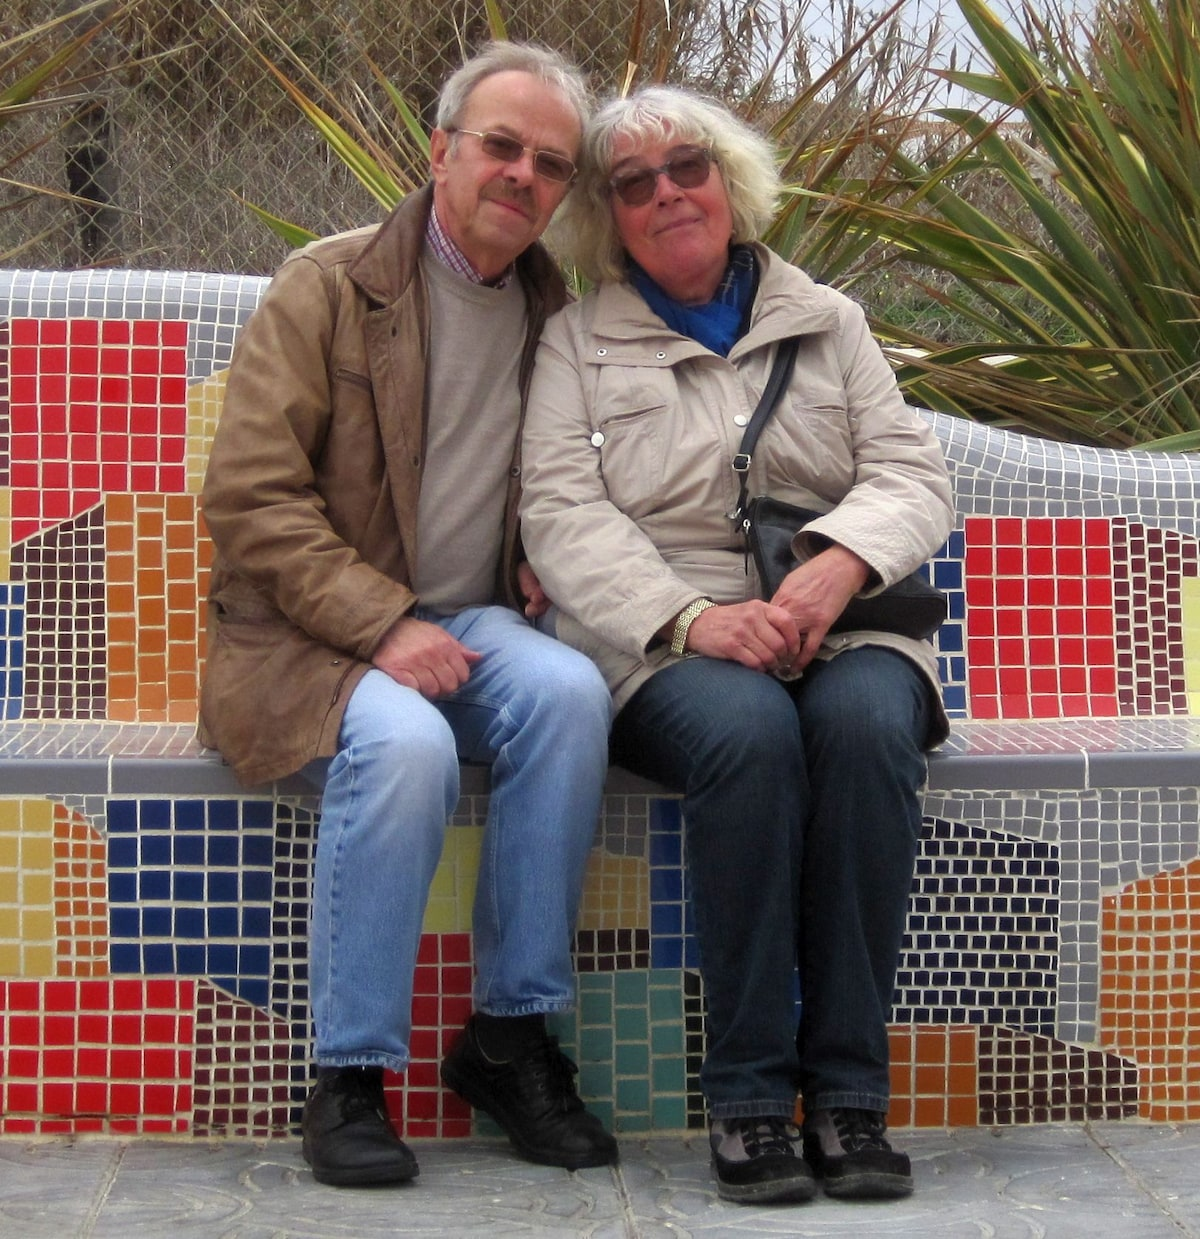 Doris & Udo from Ahrensburg